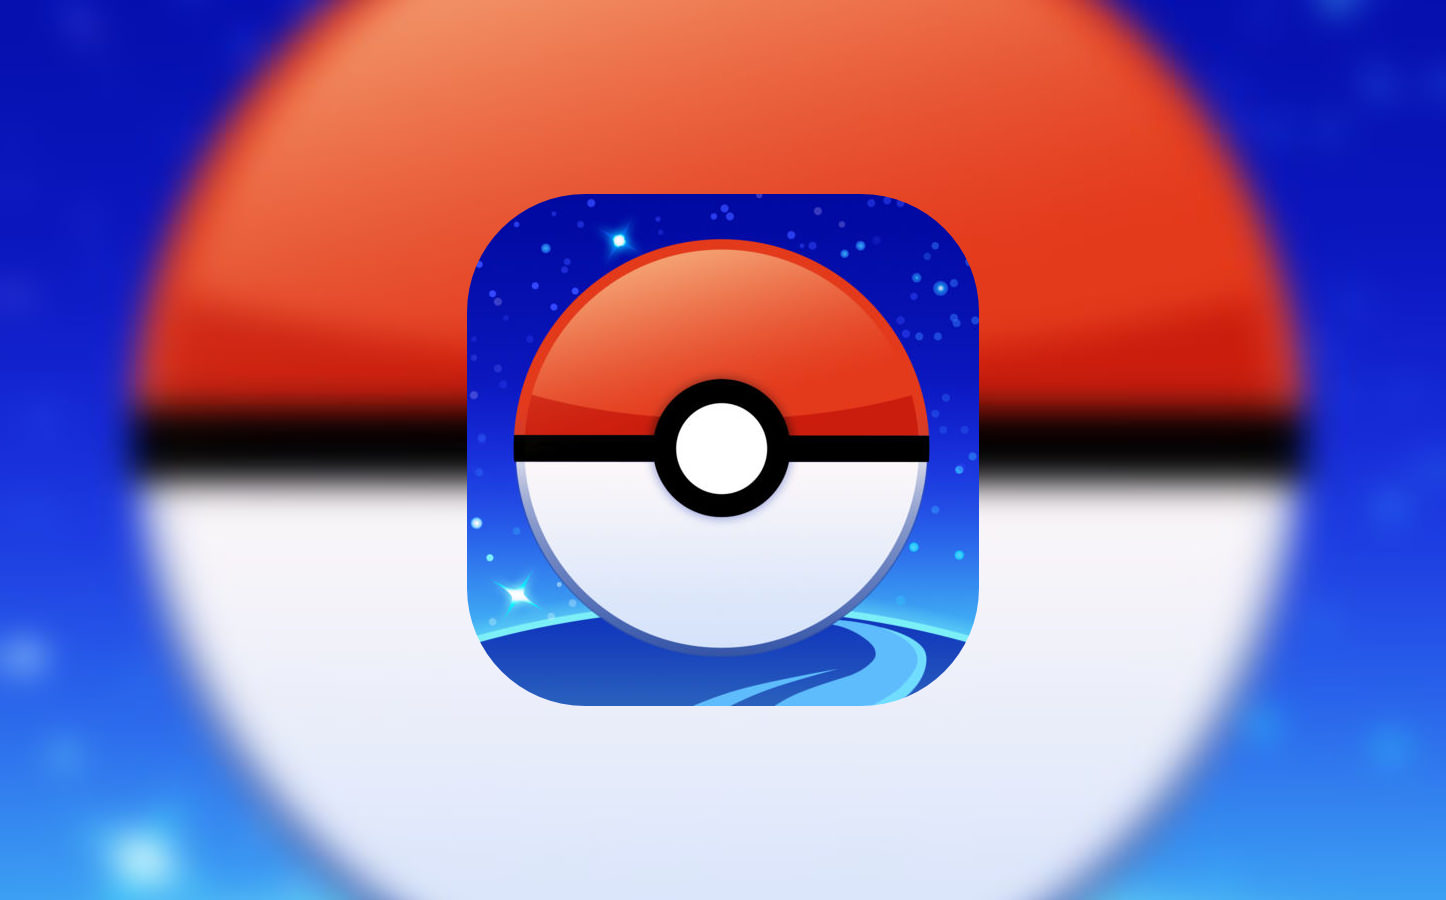 Pokemon go app logo